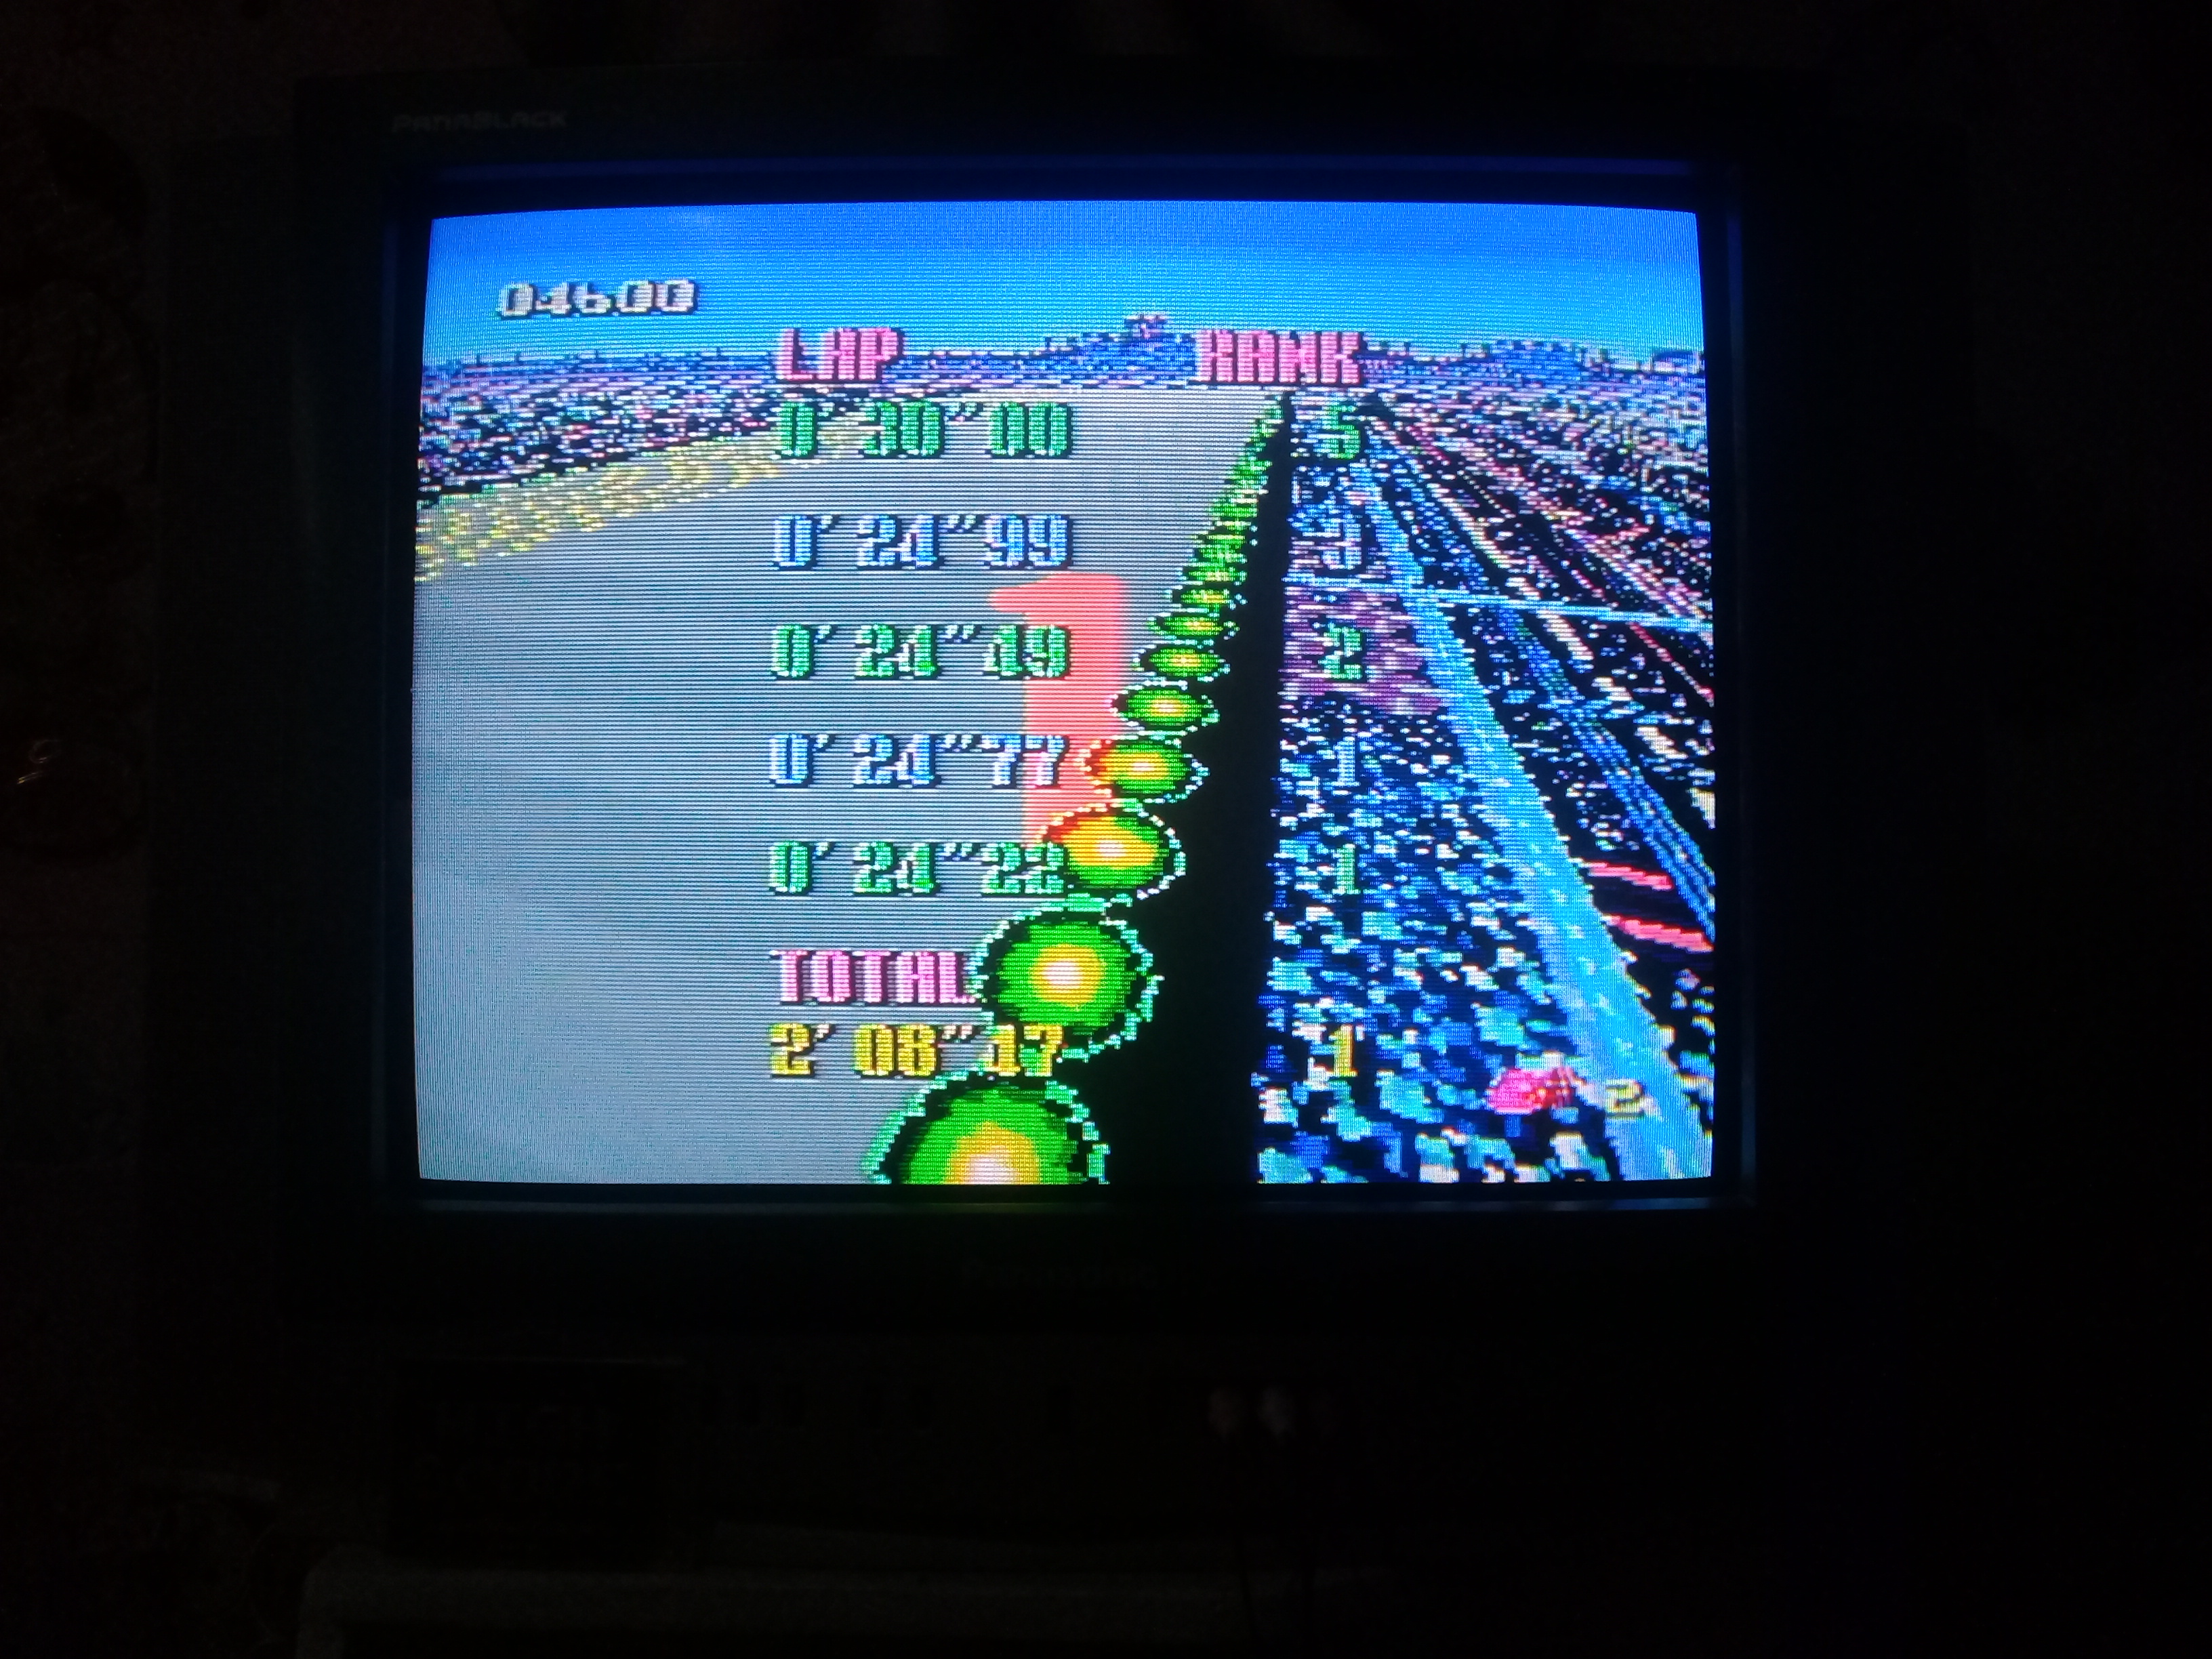 omargeddon: F-Zero: Grand Prix: Knight League [Expert]: Mute City I (SNES/Super Famicom) 0:02:08.47 points on 2019-06-25 12:26:33